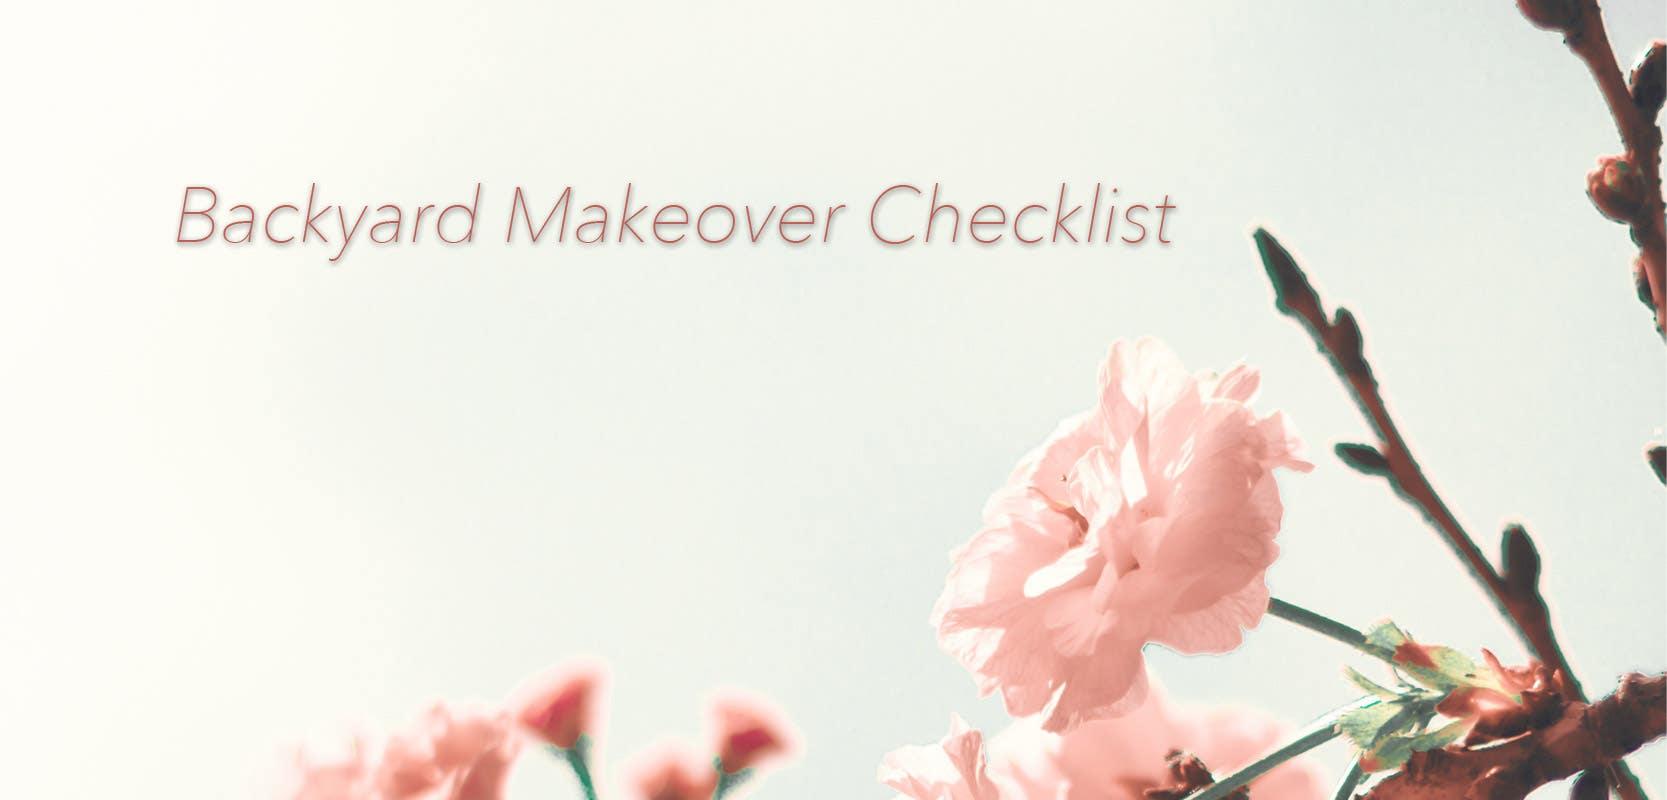 New Inspiring Trends For A Backyard Makeover